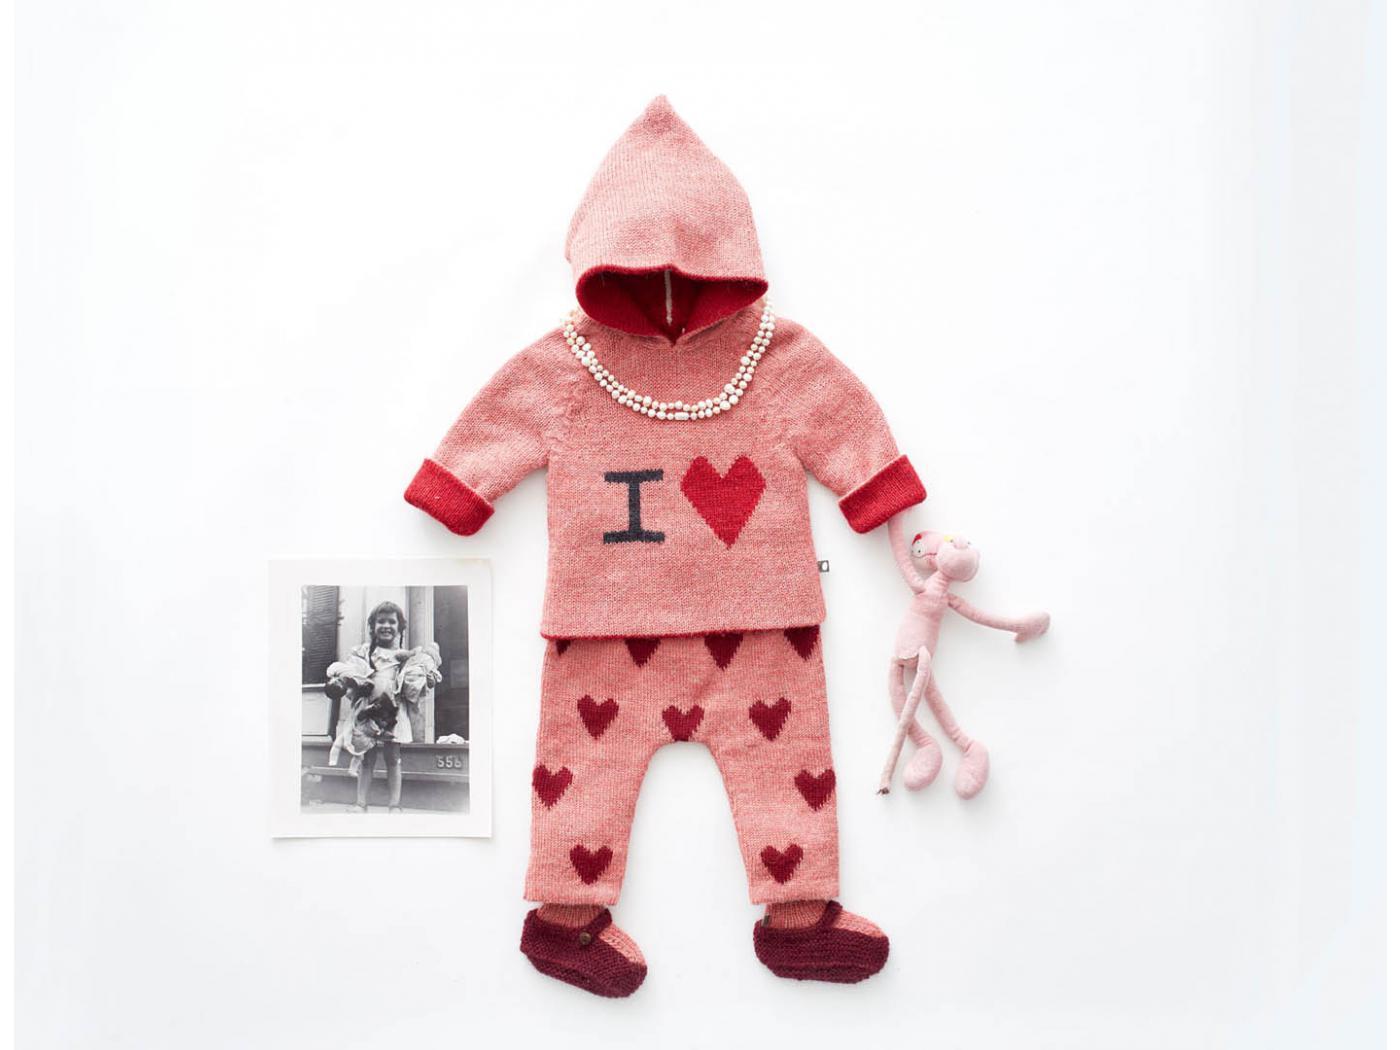 Oeuf Baby Clothes Pull 224 Capuche Rose I Love En Alpaga 6m